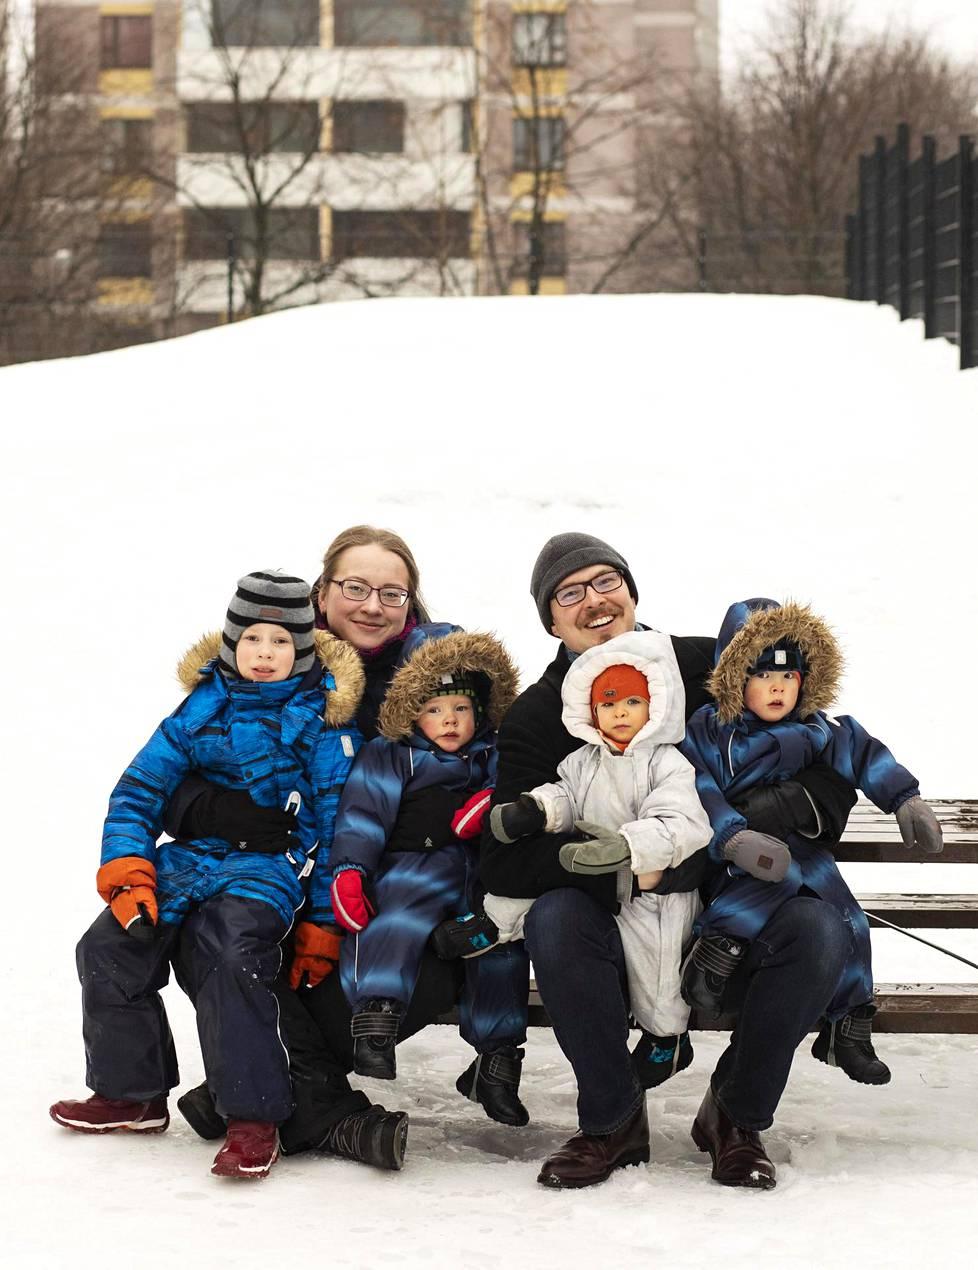 Tiia ja Simo Syrman ja heidän lapsensa Eero (vas.), Vilho, Iida ja Aarni kotikulmilla Pasilassa.